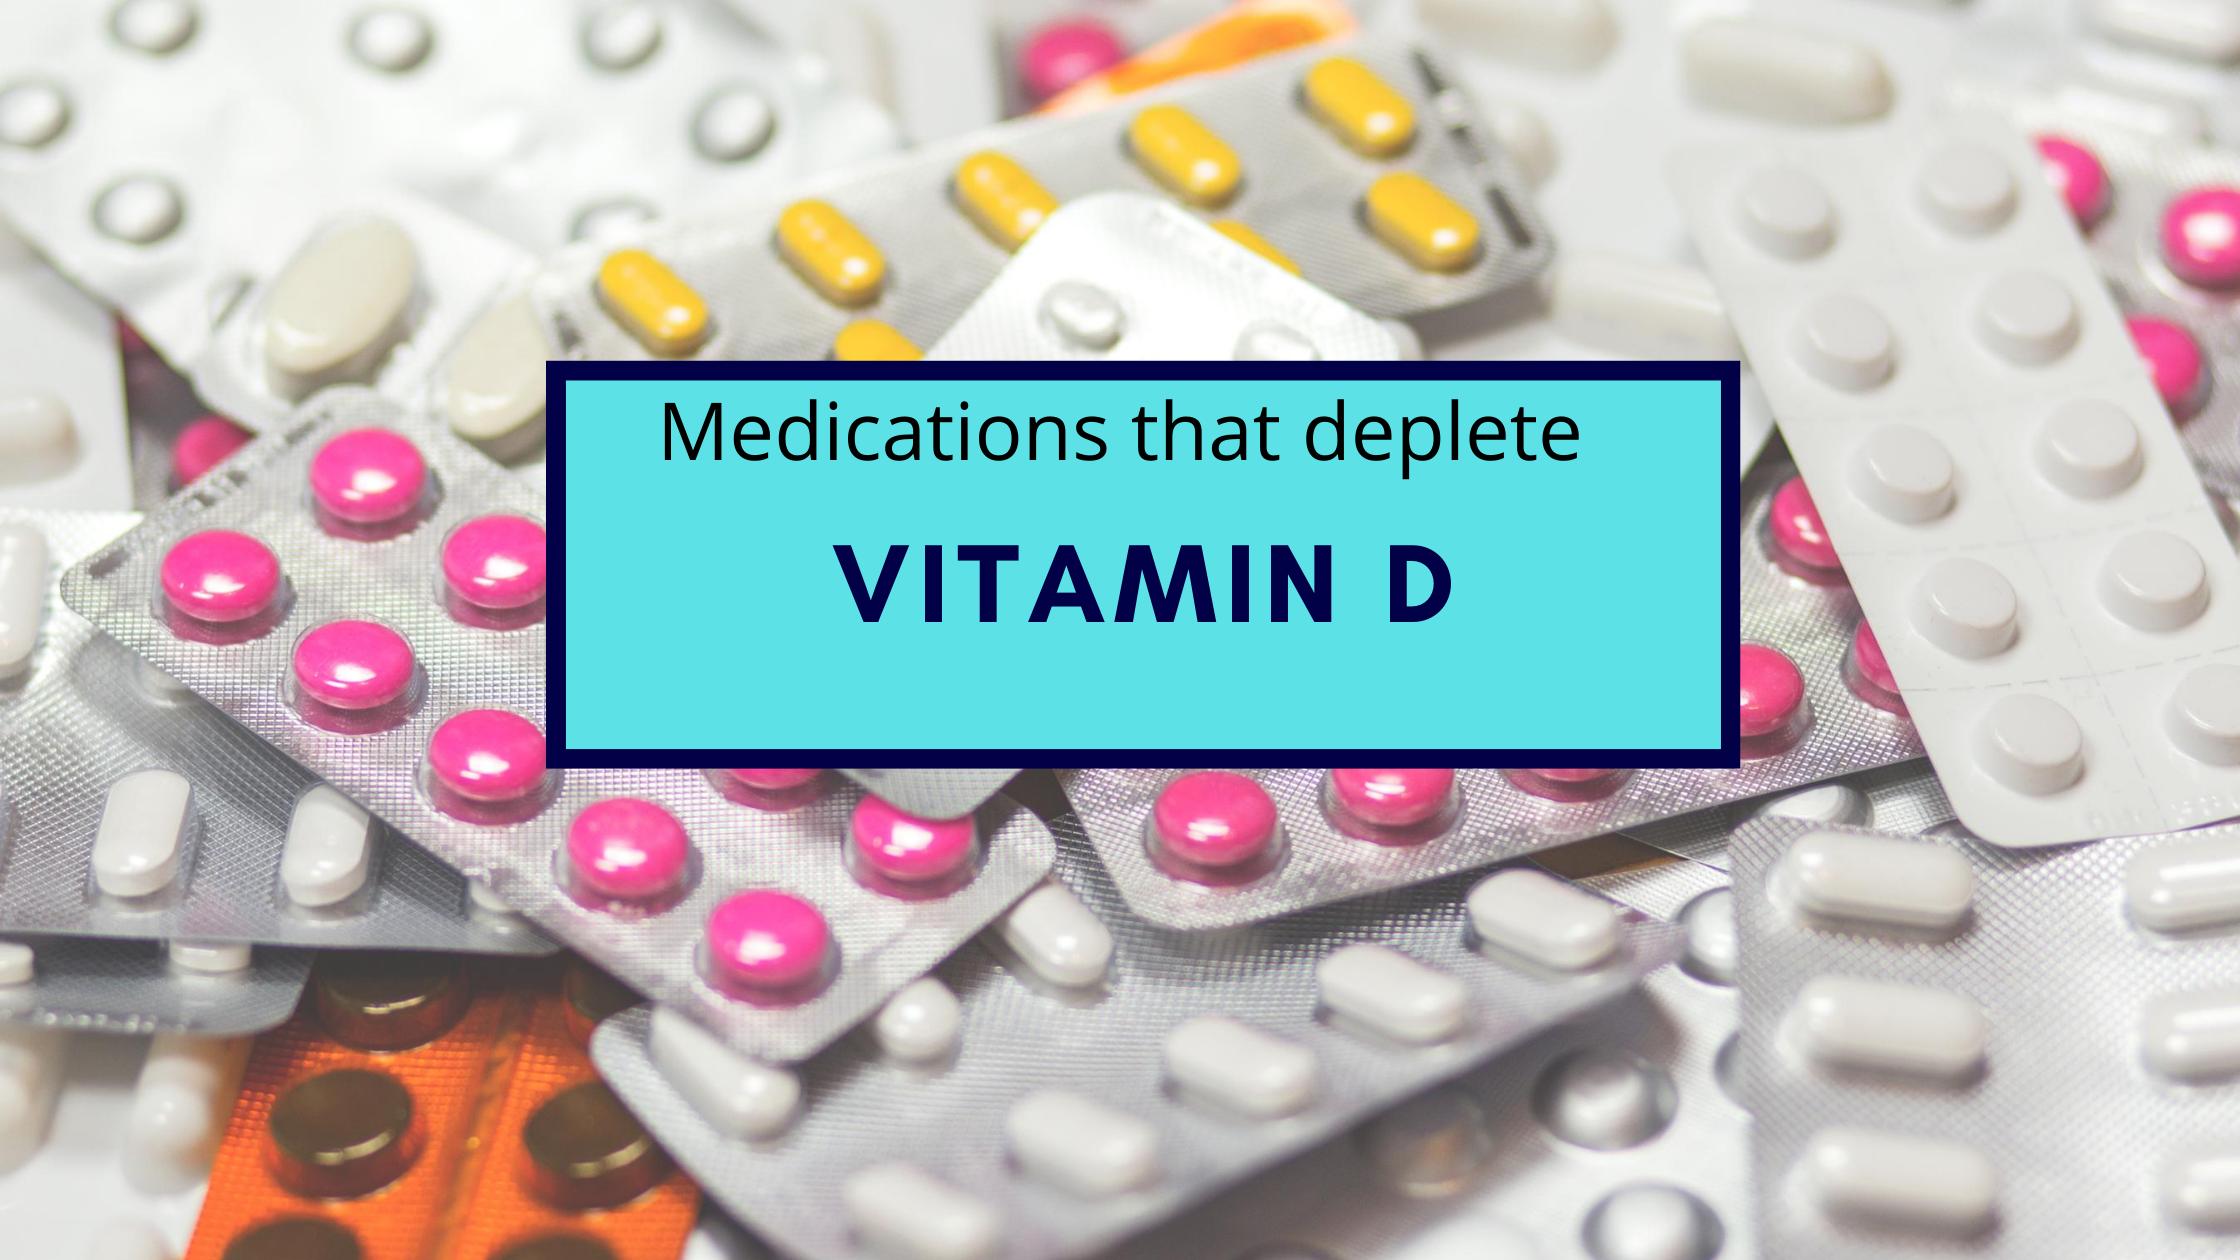 Medications that deplete vitamin D